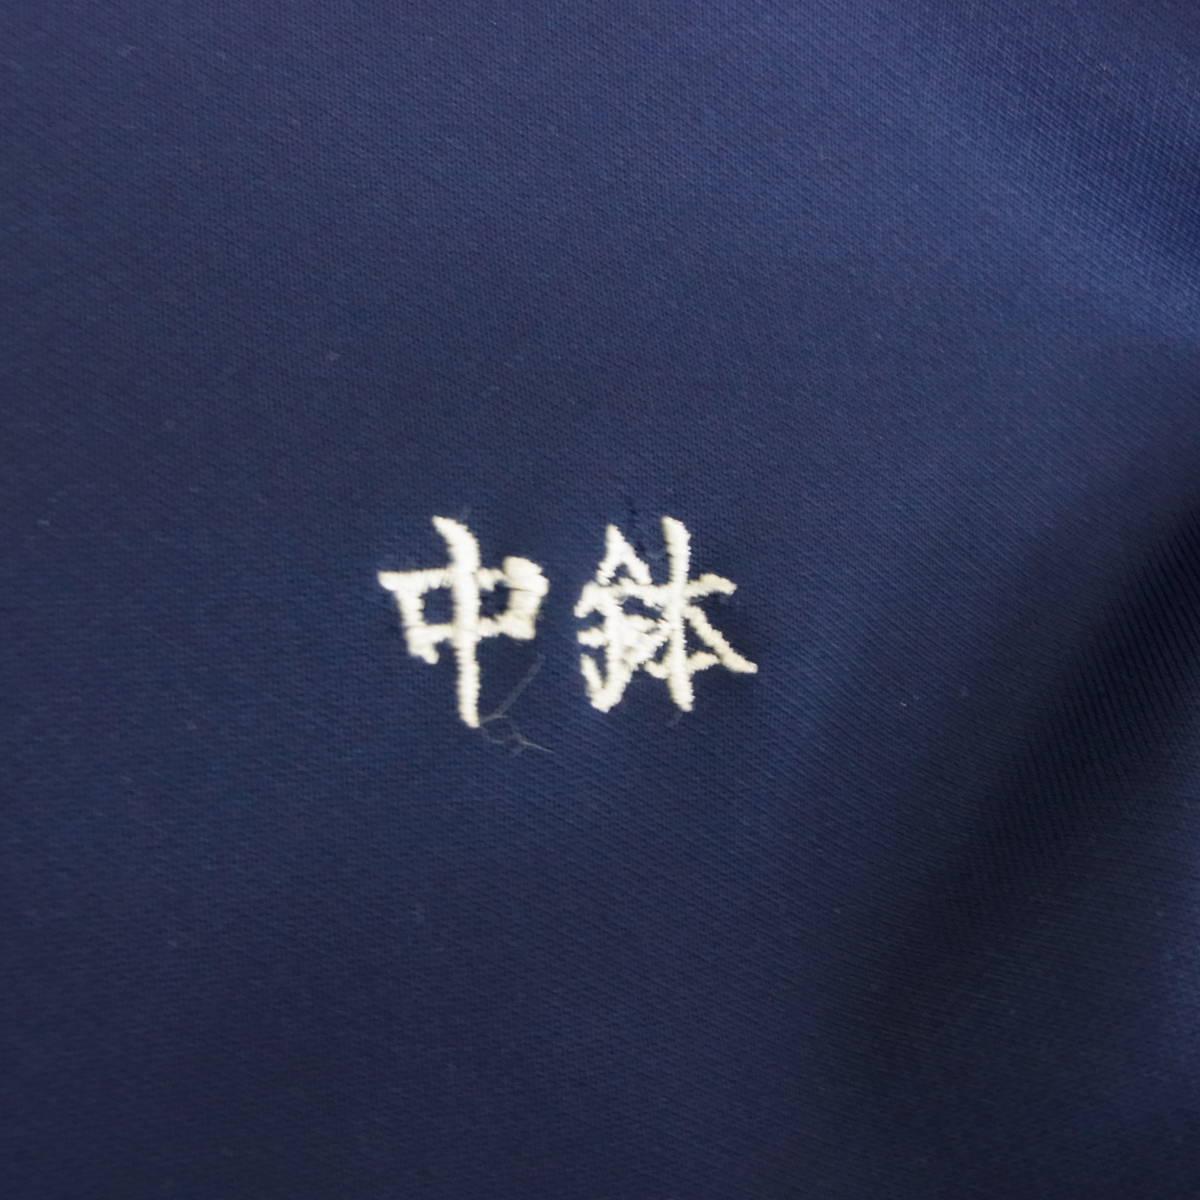 YONEX ヨネックス☆メンズ Tシャツ Mサイズ ☆吸汗速乾 メッシュ加工 日本製 ☆スポーツ トレーニング フィットネス_画像3